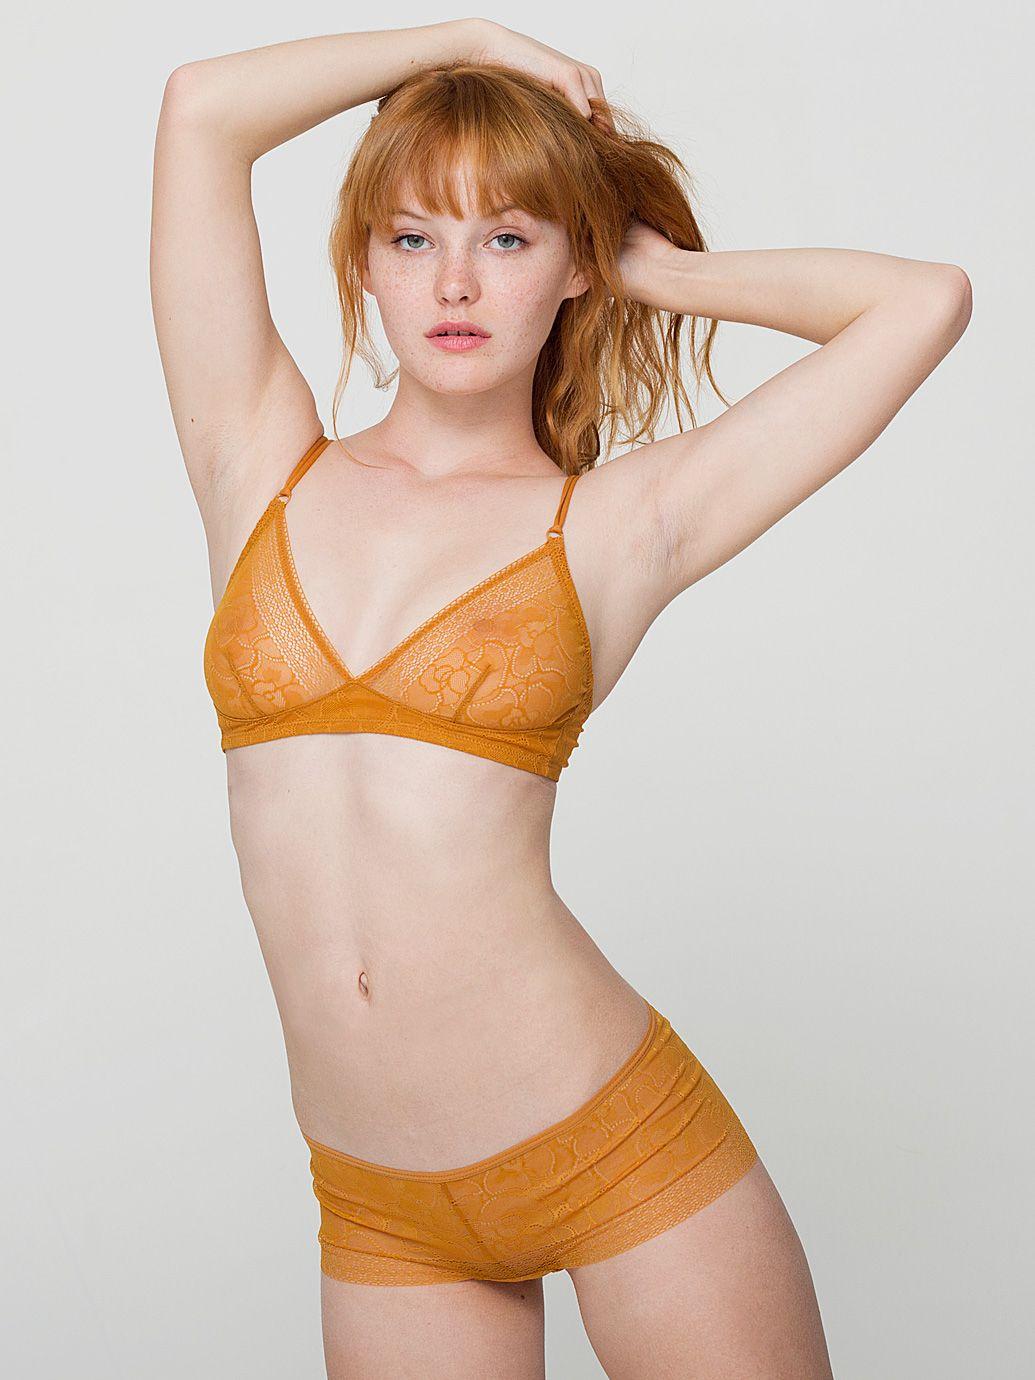 redhead-underwear-mature-hairy-lady-sex